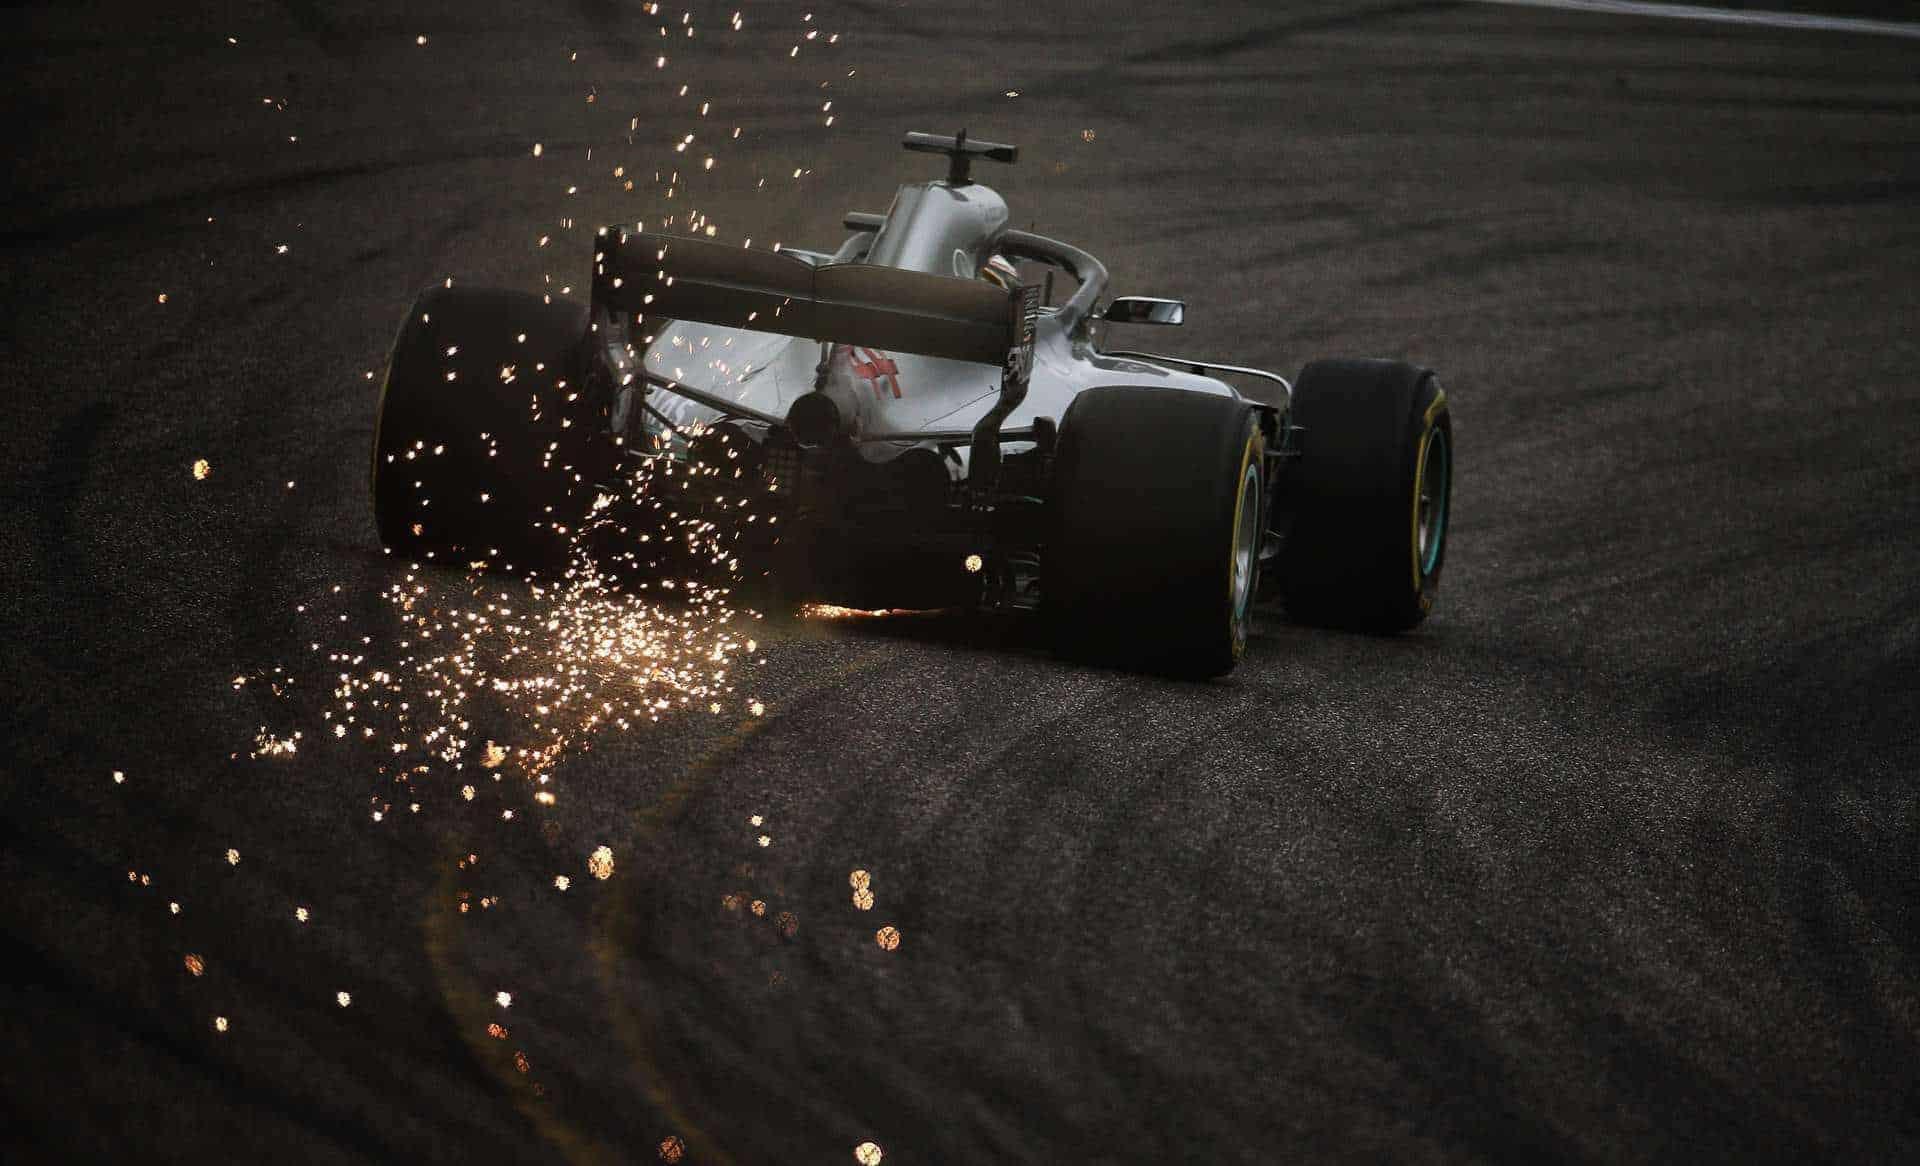 Lewis Hamilton Chinese GP F1 2018 sparks Mercedes W09 Photo Daimler